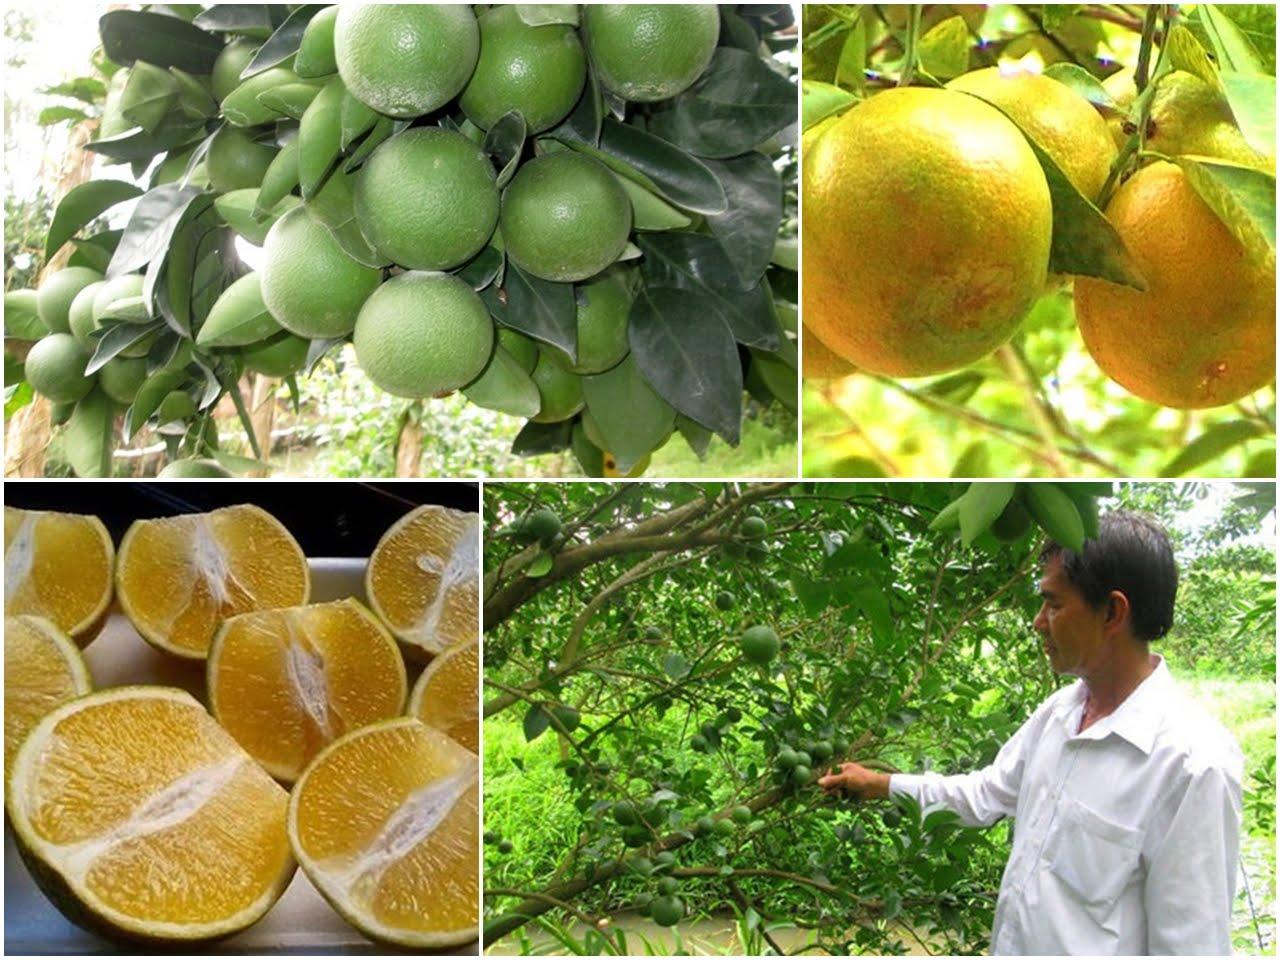 Agricultores de Hau Giang prosperan gracias al cultivo de naranja